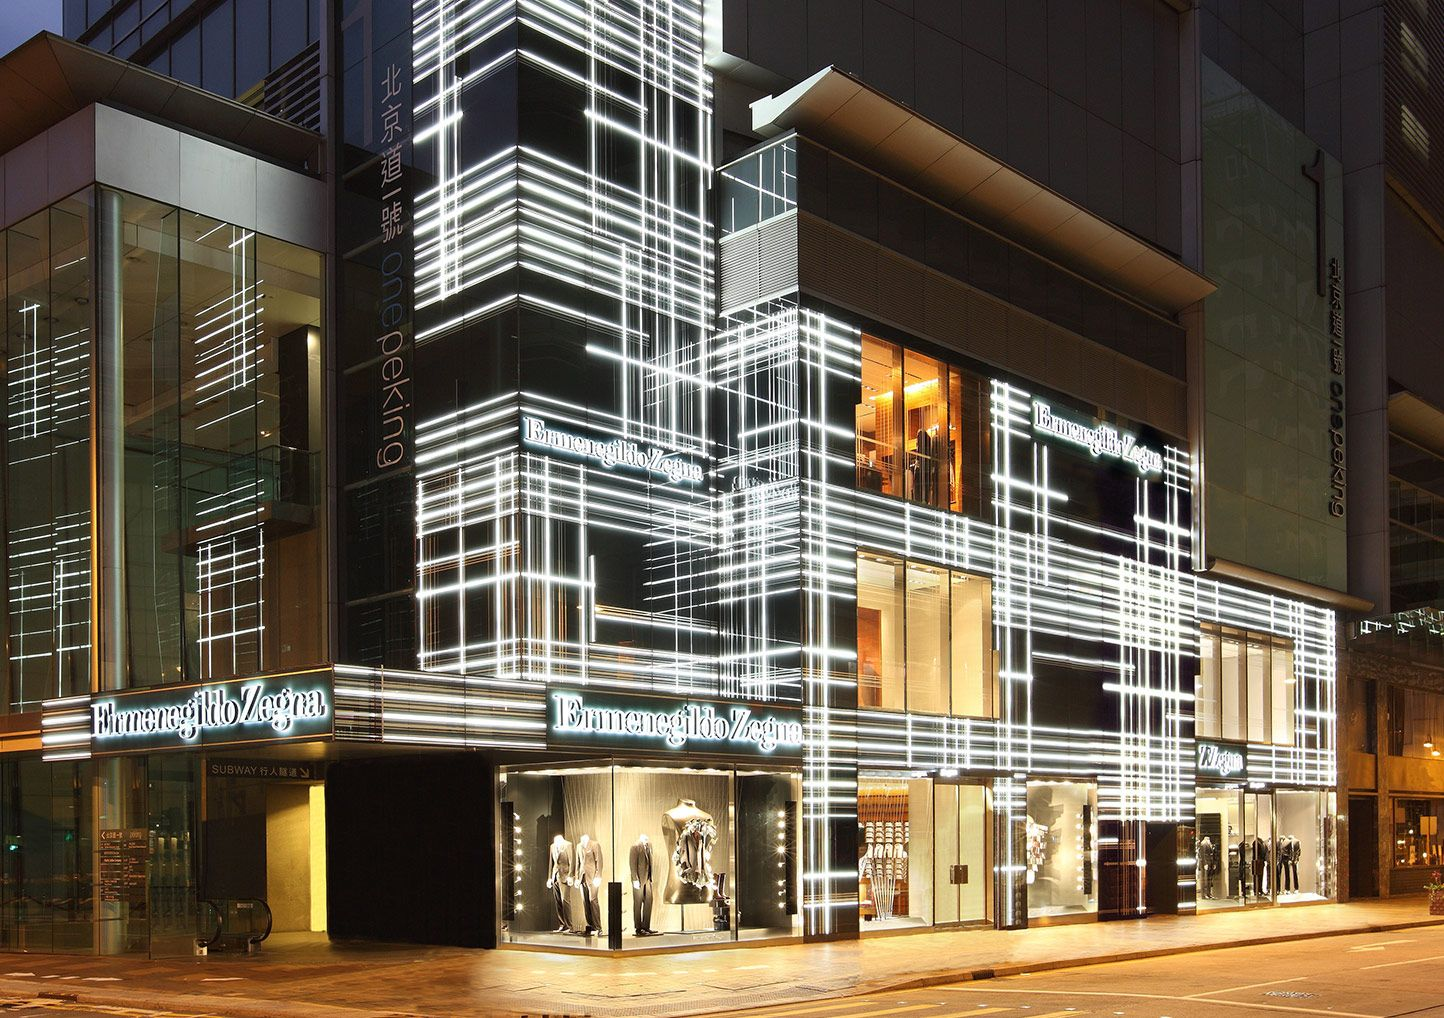 peter marino ermenegildo zegna boutique hong kong facade architectural inspiration. Black Bedroom Furniture Sets. Home Design Ideas